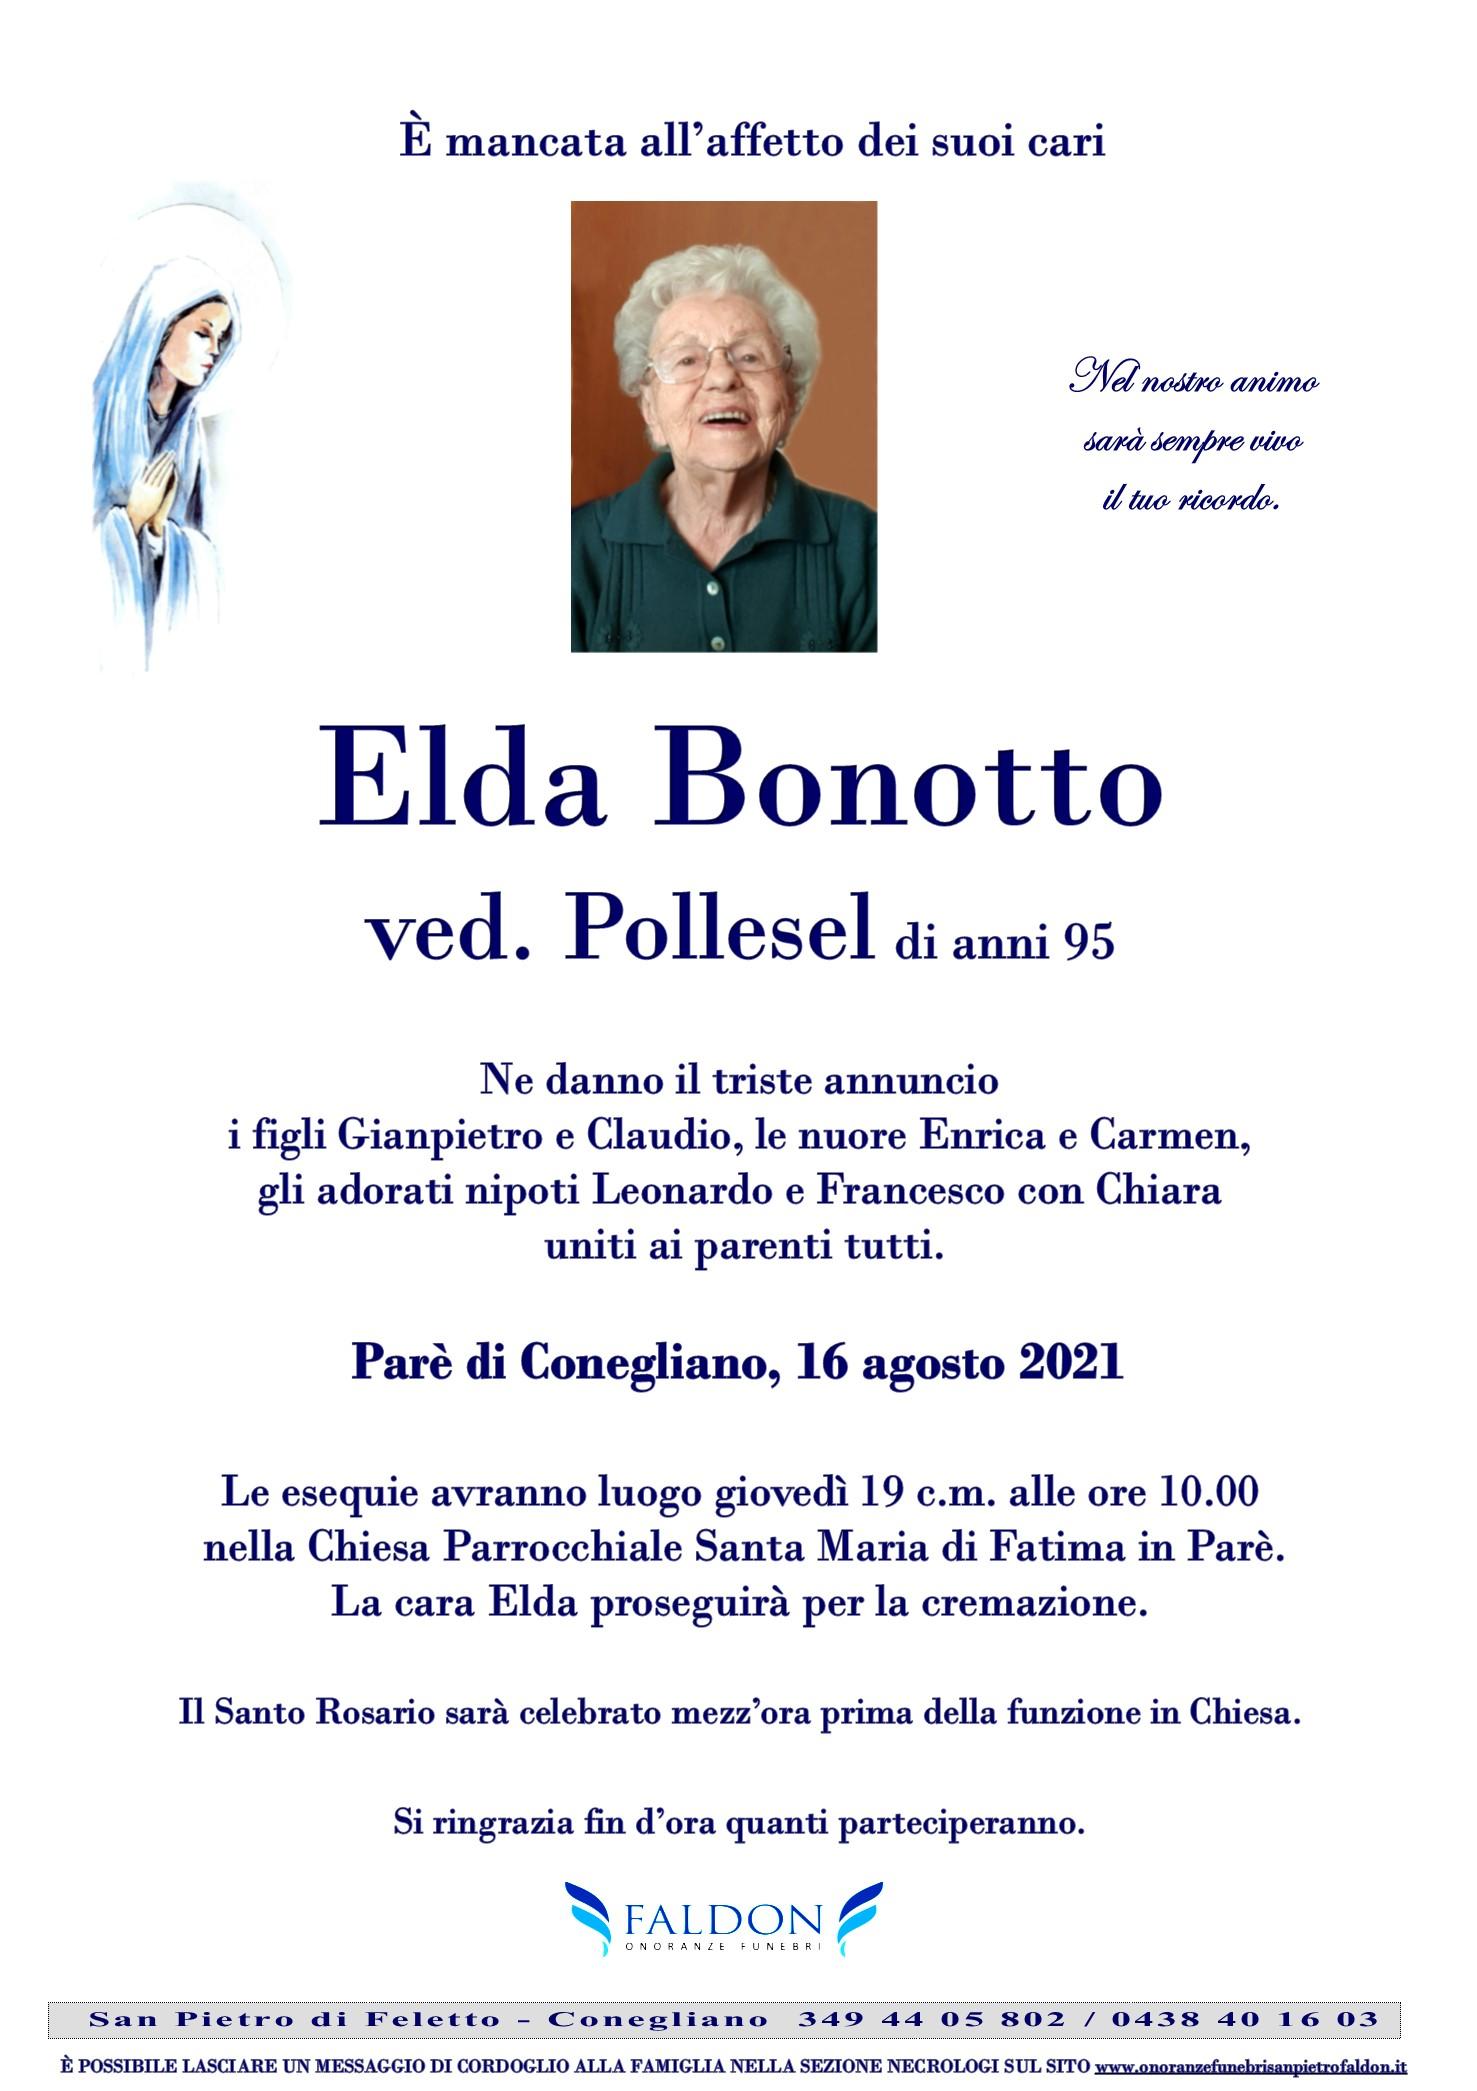 Elda Bonotto